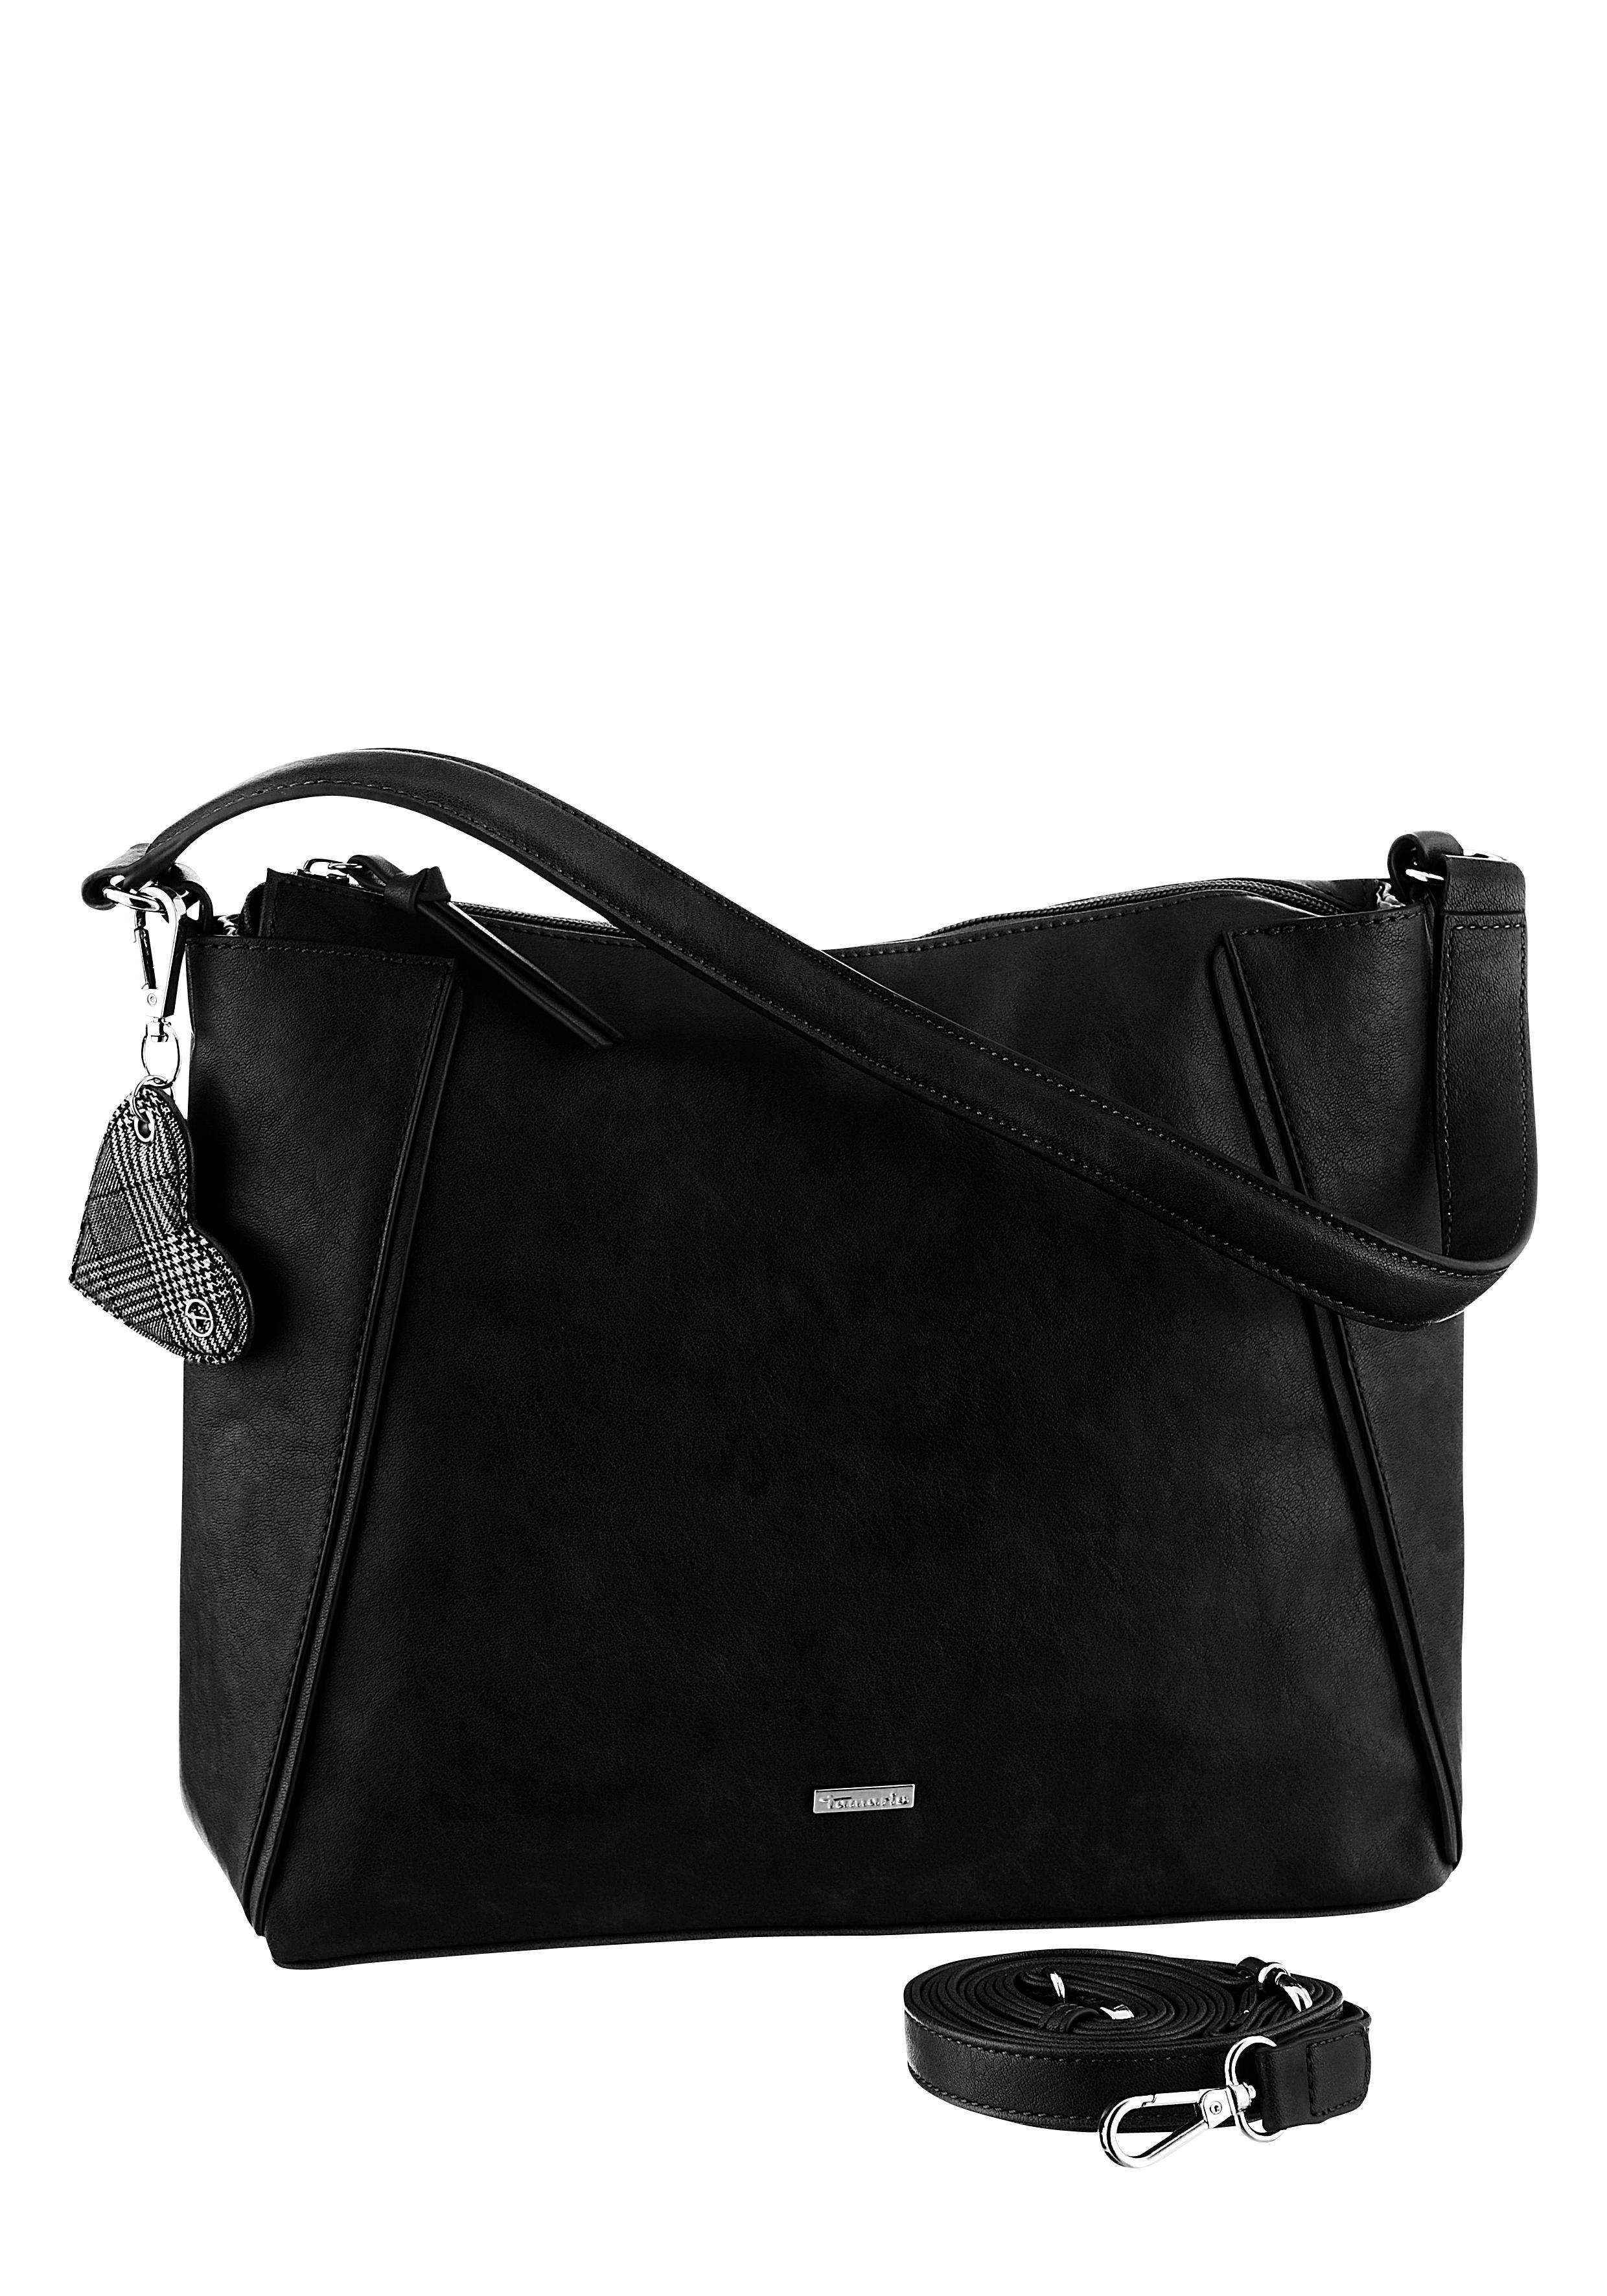 CRICKIT Schultertasche »FLORENCE Crossbody Bag«, Dekorative Reißverschlüsse, Grüner Zipper online kaufen | OTTO